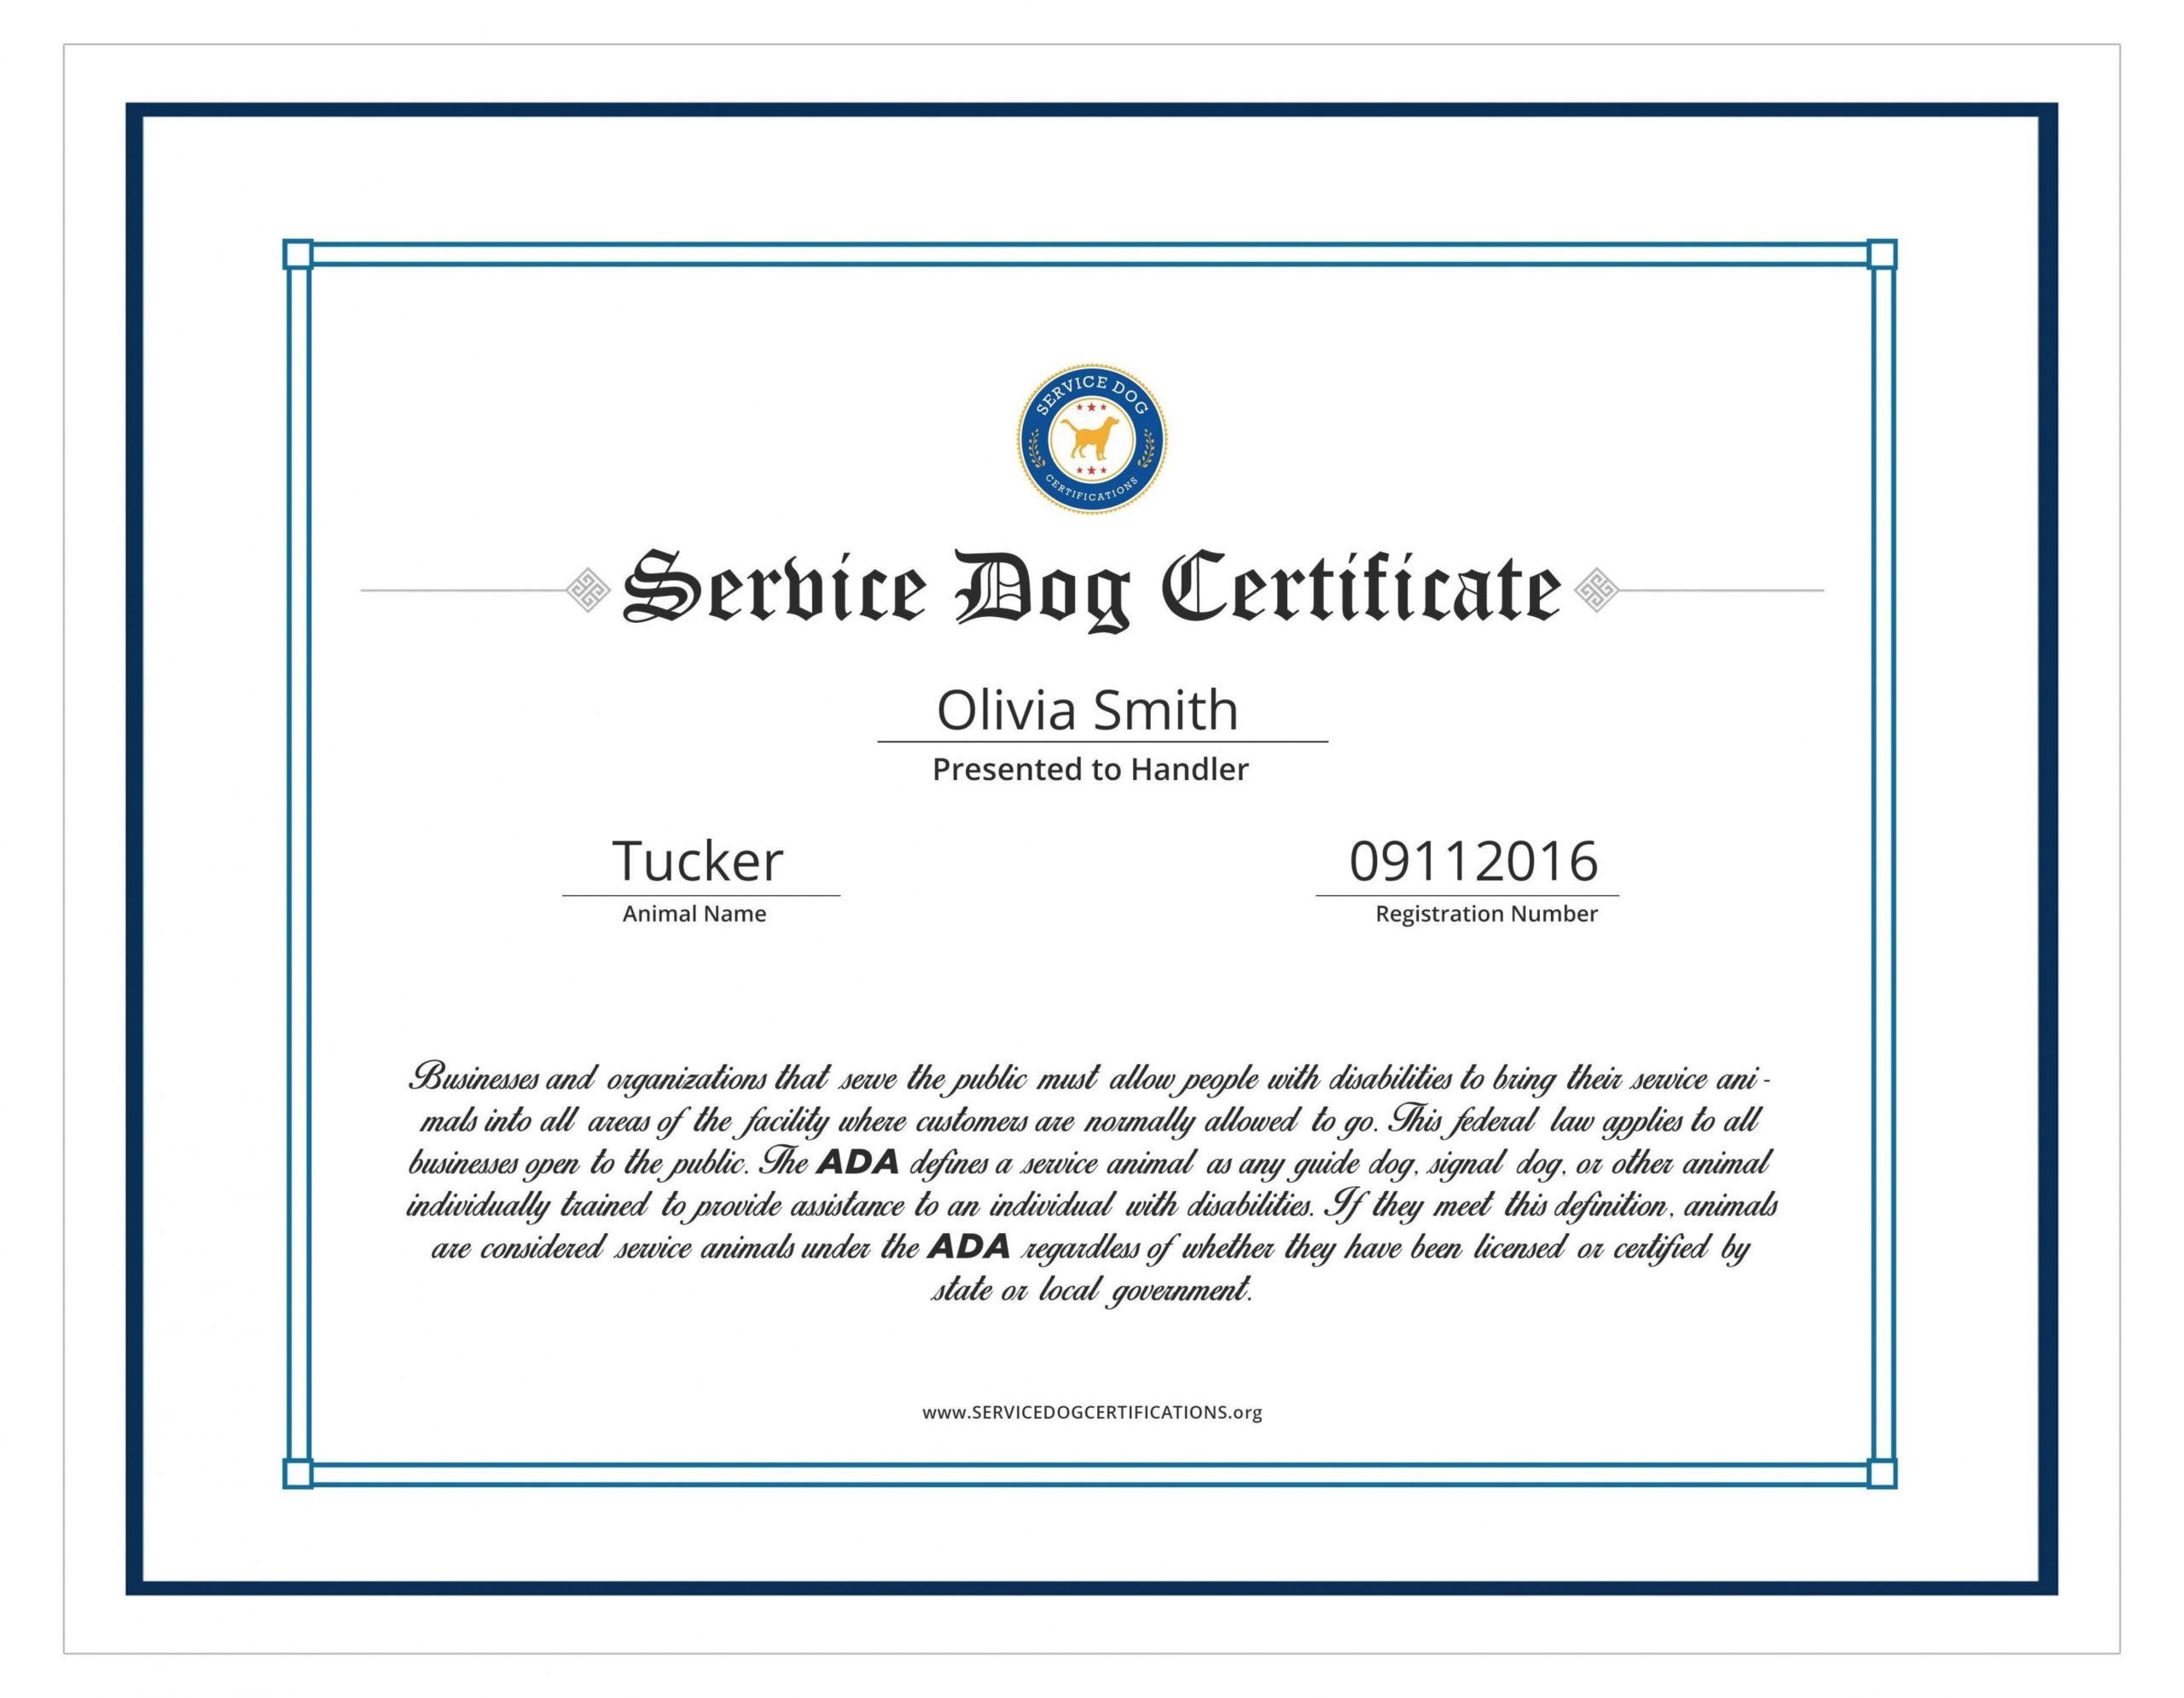 Service Dog Certificate Template  Addictionary pertaining to Best Dog Training Certificate Template